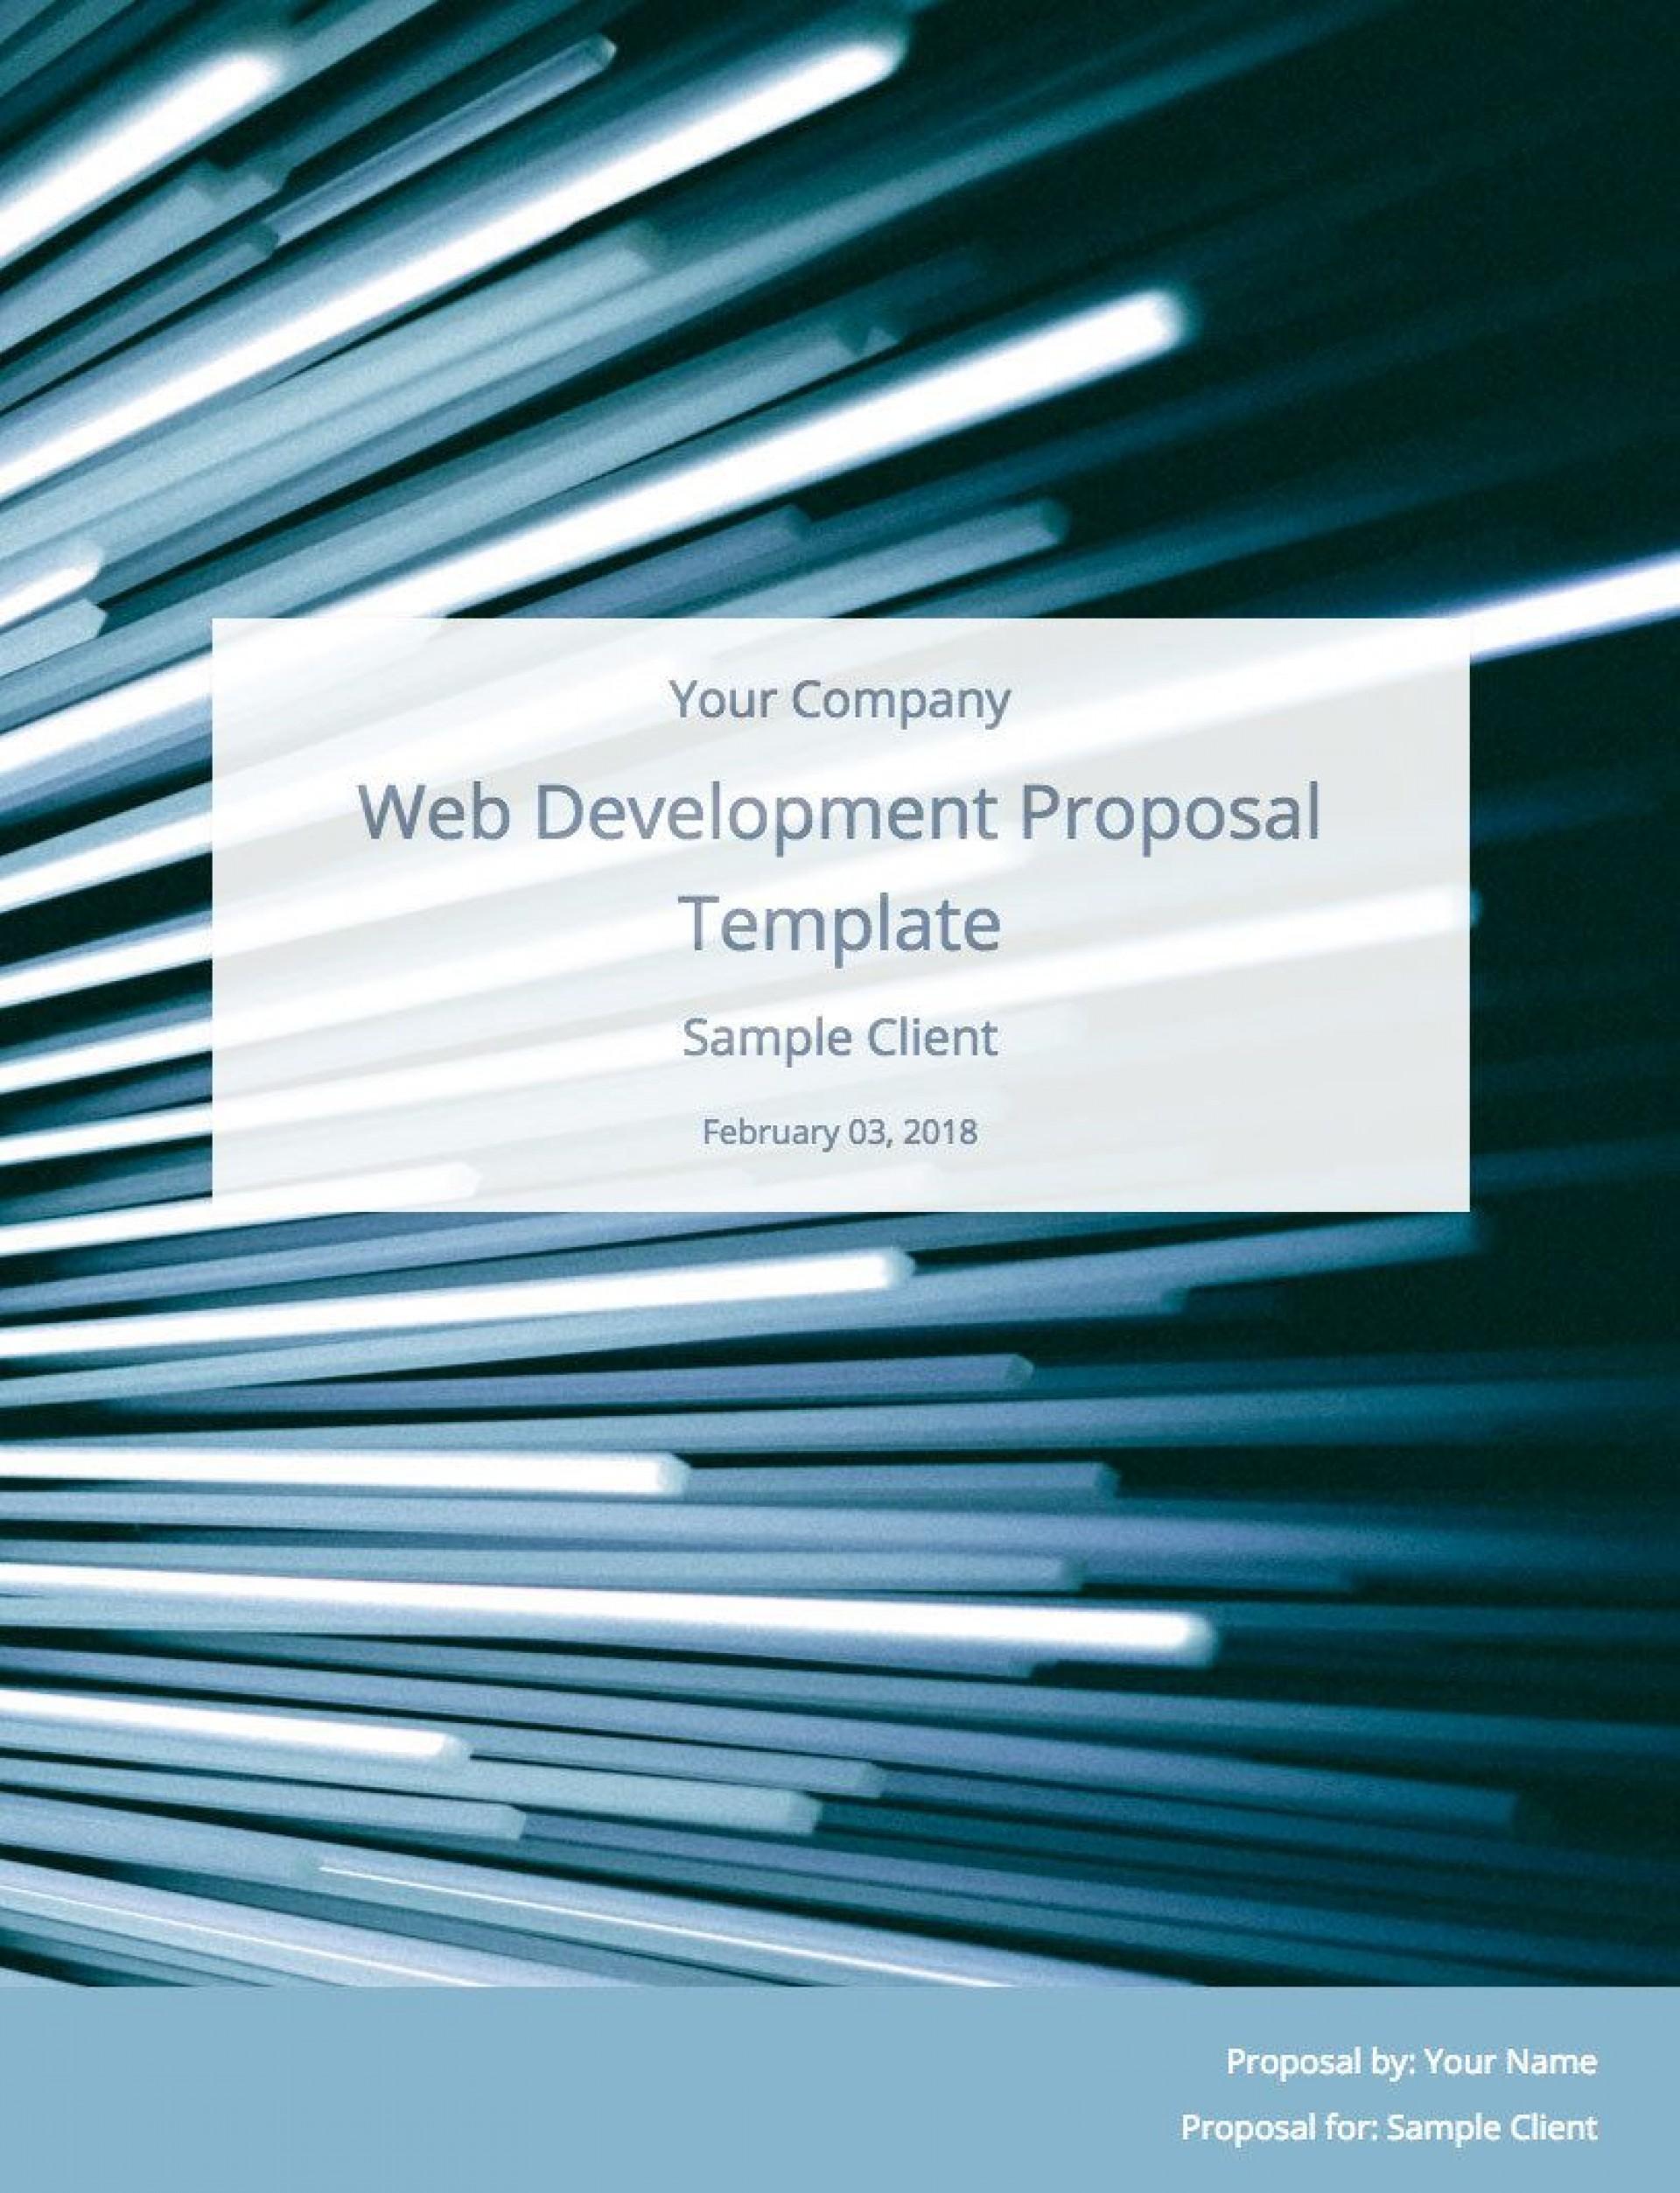 008 Unbelievable Website Development Proposal Format High Def  Web Template Pdf Sample Ecommerce1920